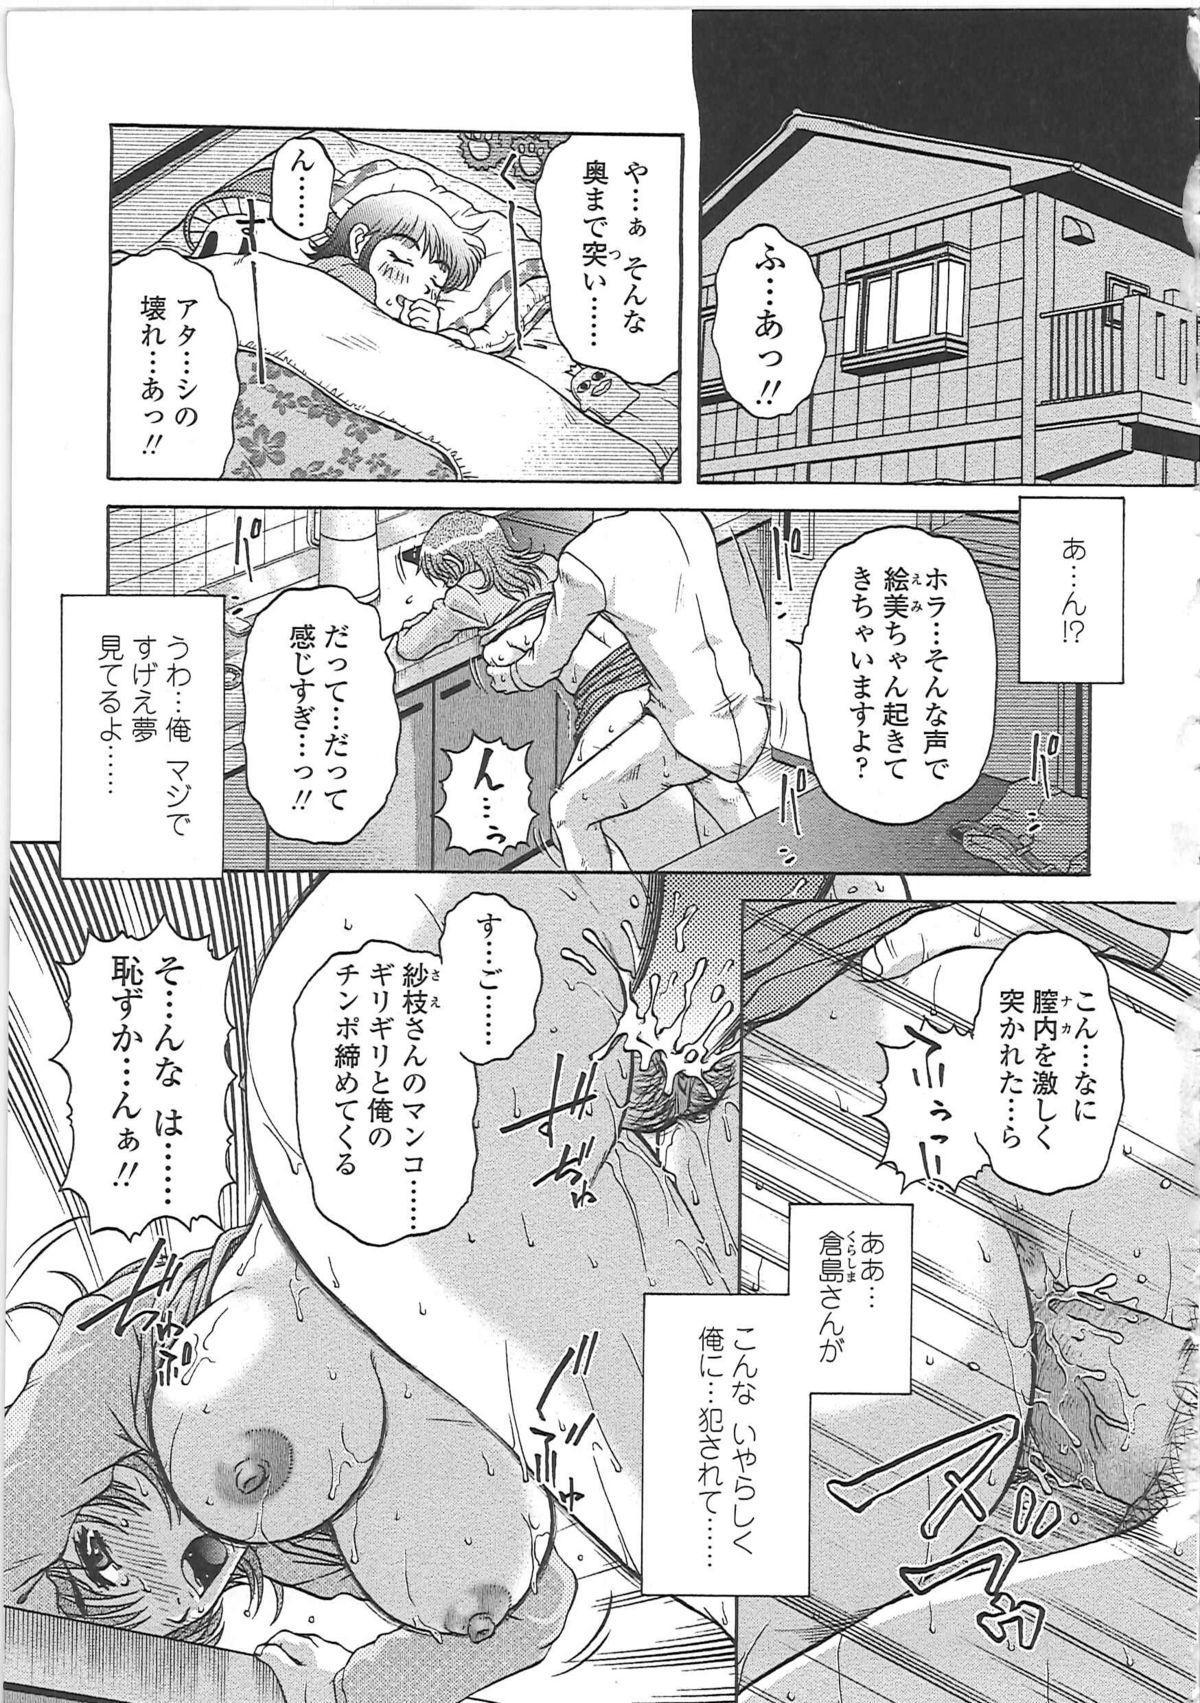 Nikuzuma Tsuushin - Erotic Wife Communication 95